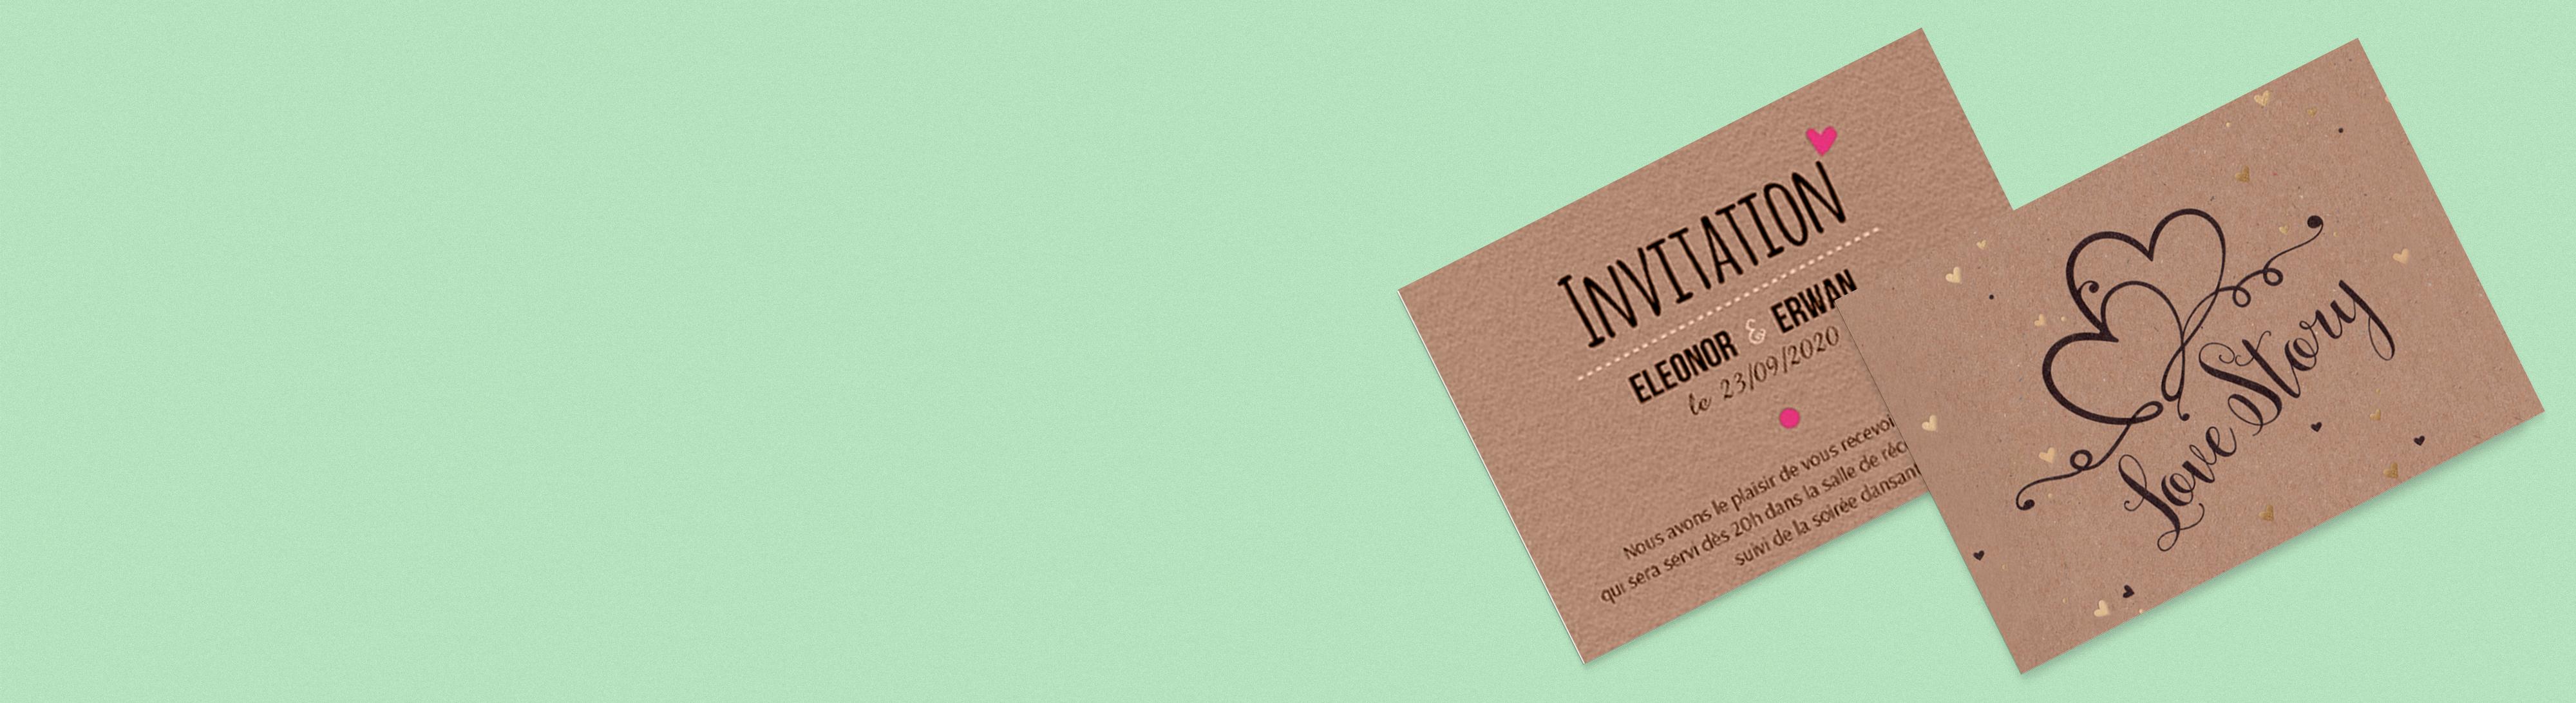 Carton invitation papier recyclé